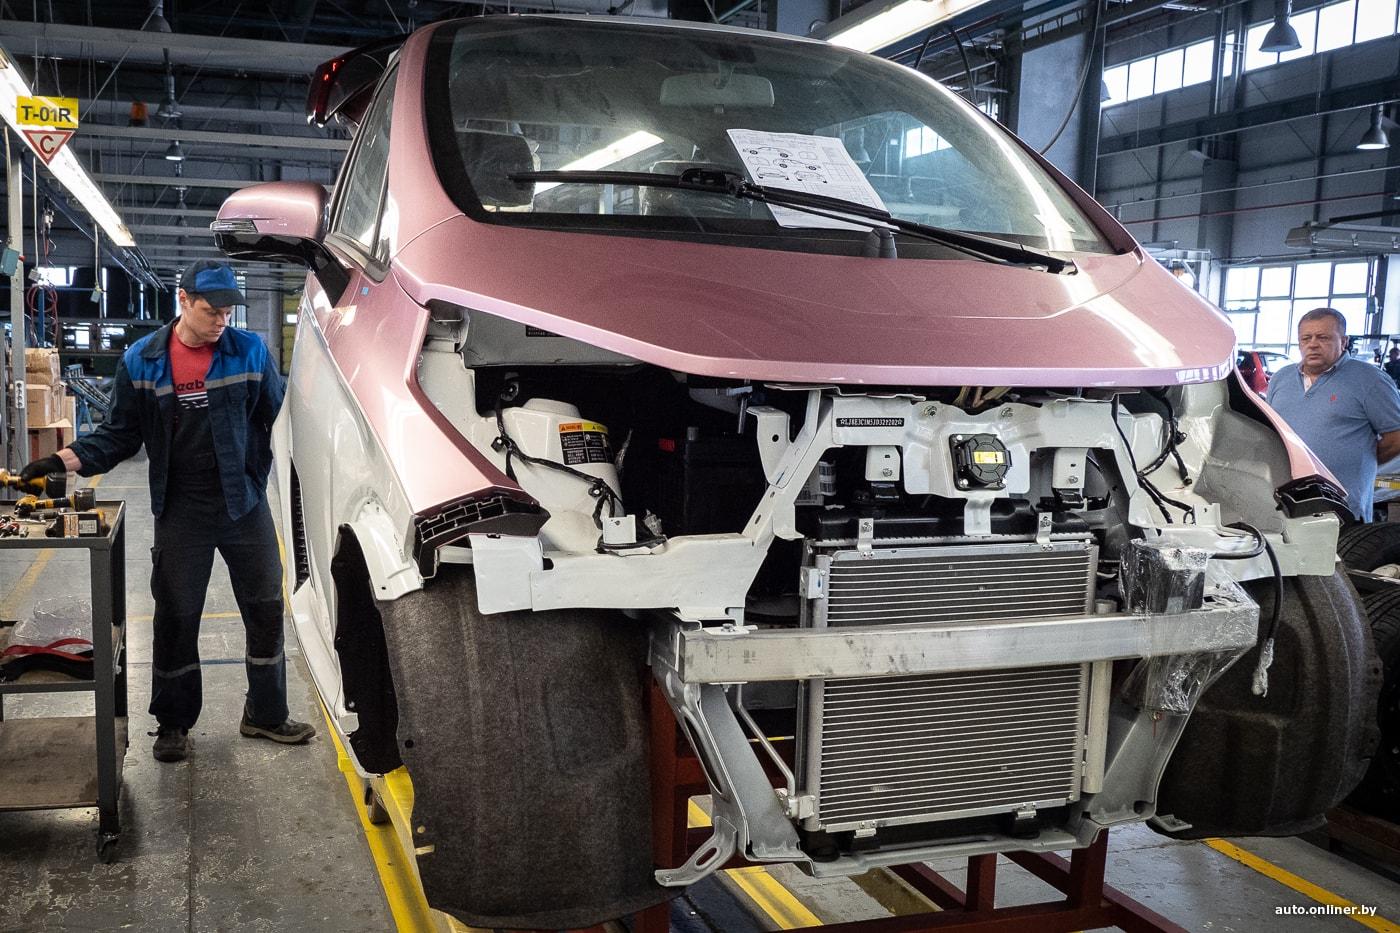 Фоторепортаж: в Беларуси началось производство электромобилей